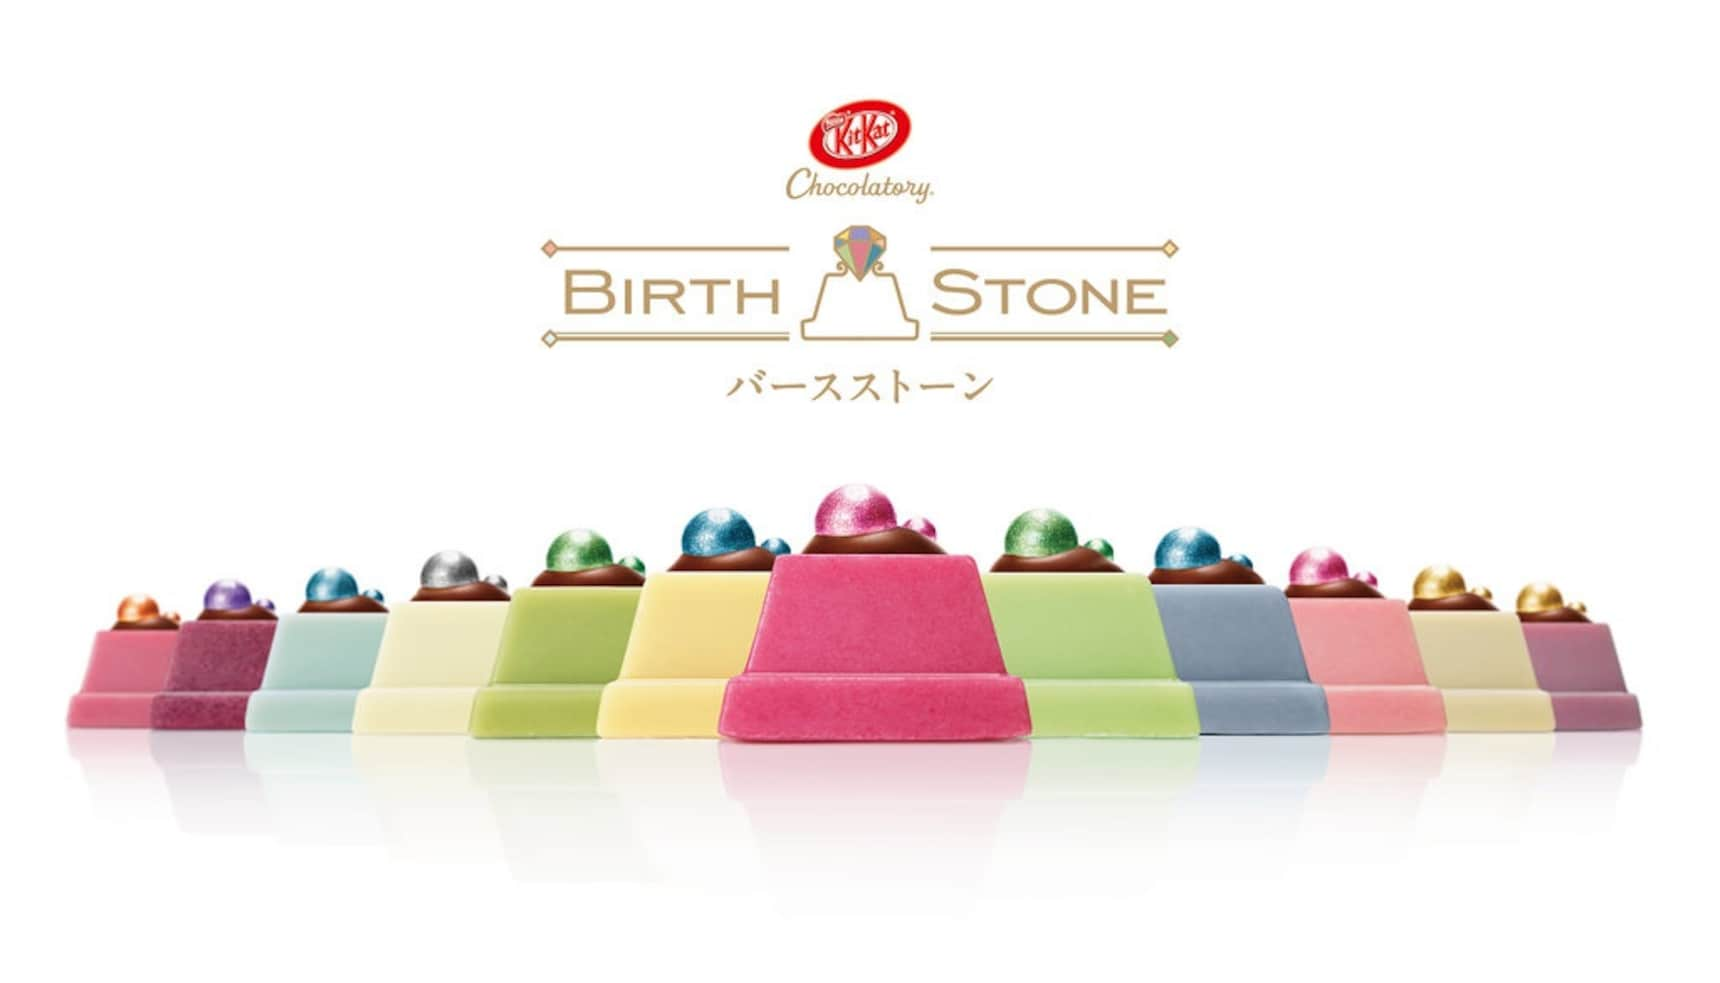 Birthstone-Inspired Kit Kats Look Amazing